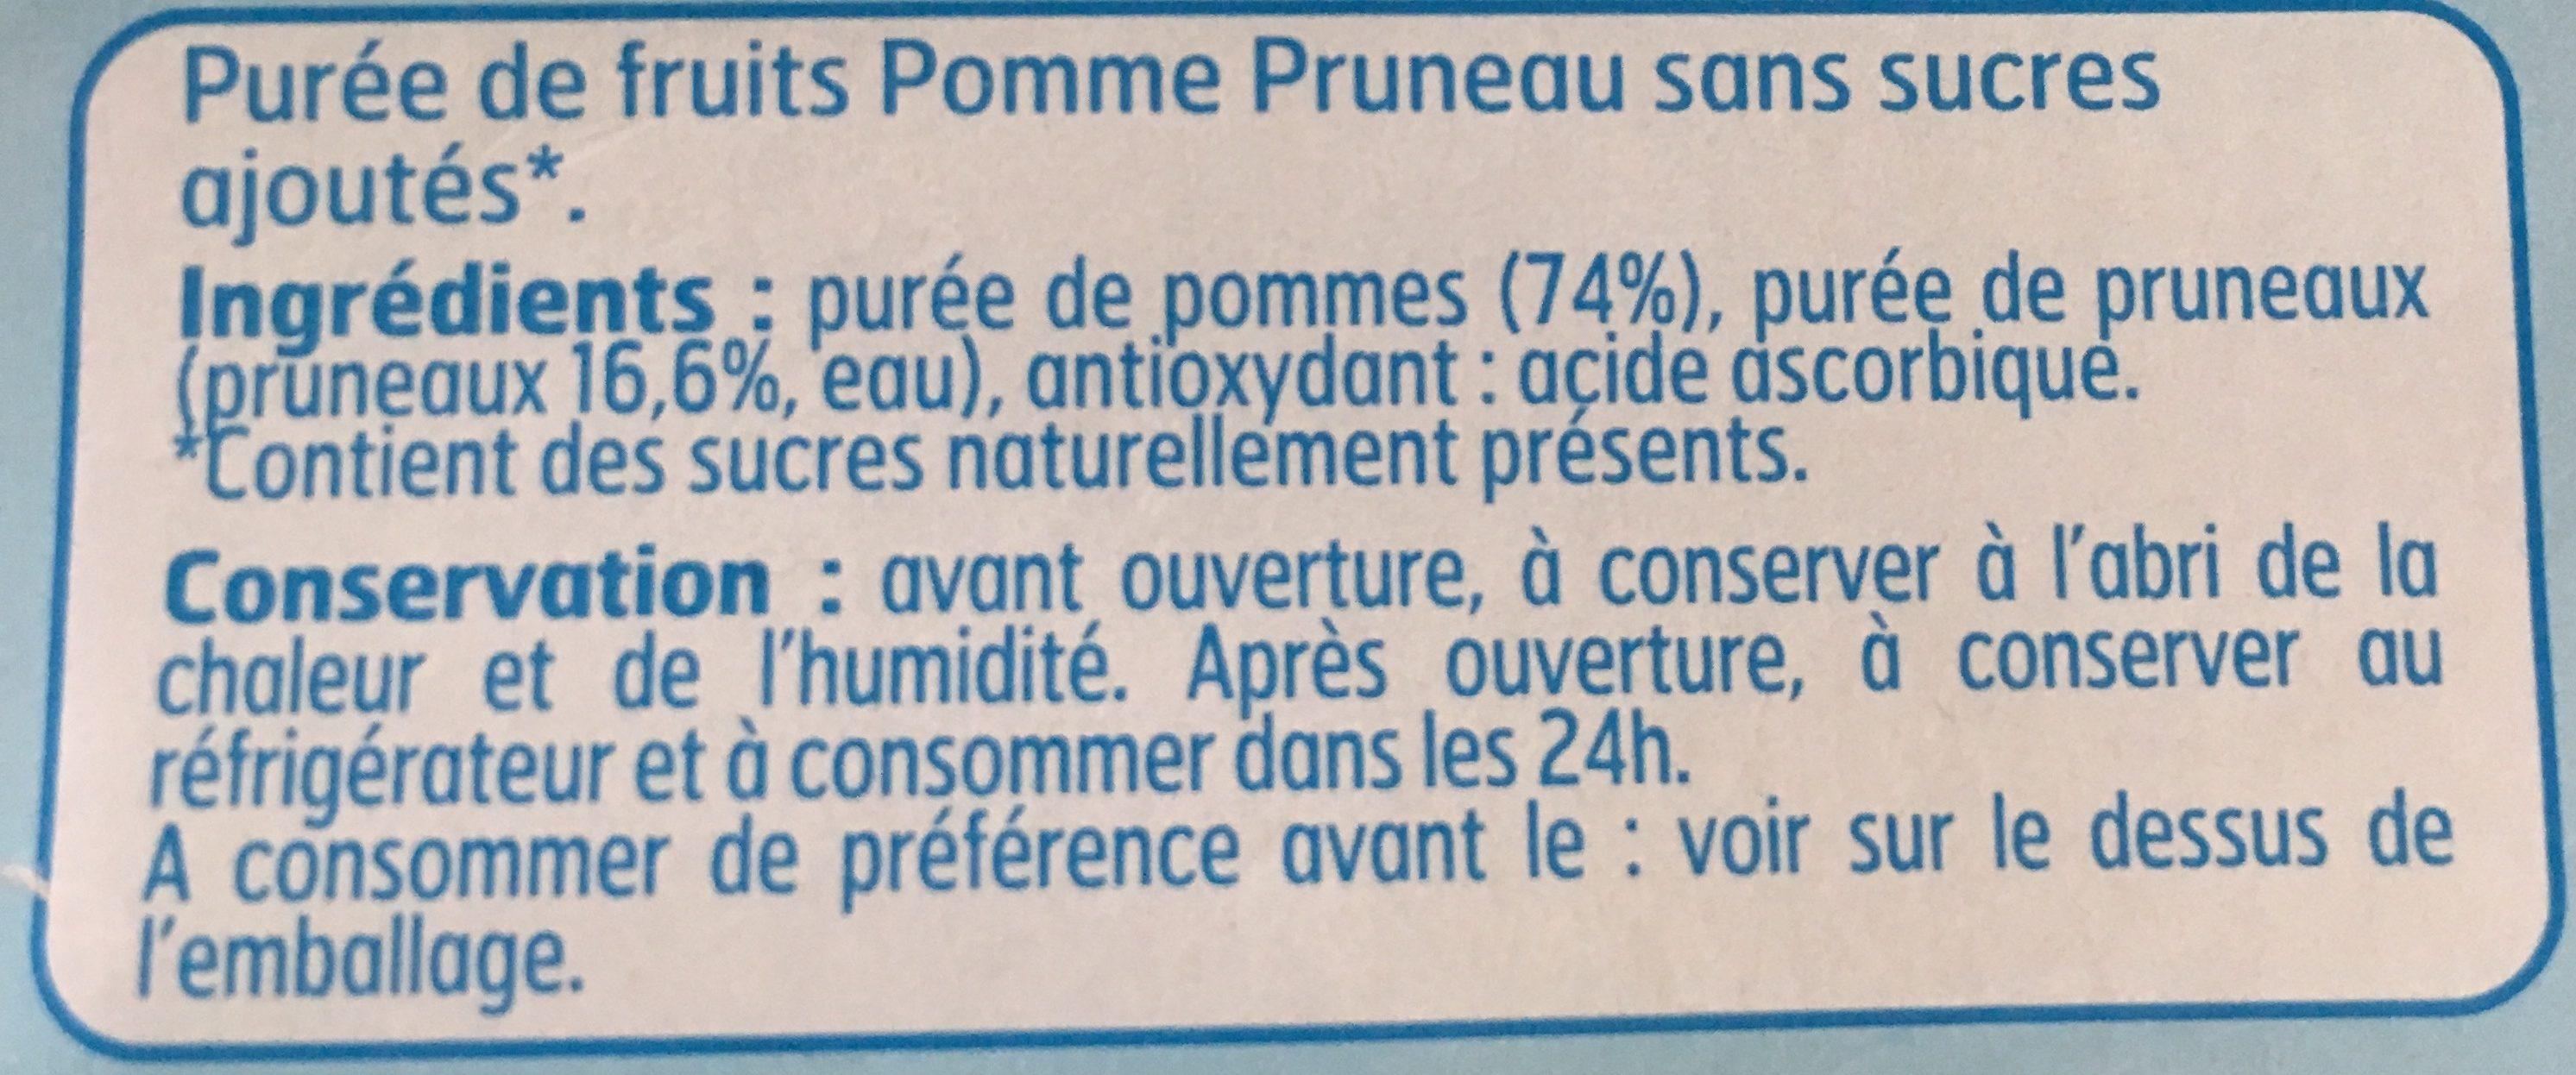 Compote Pom / Prun. S / S. - Ingrédients - fr